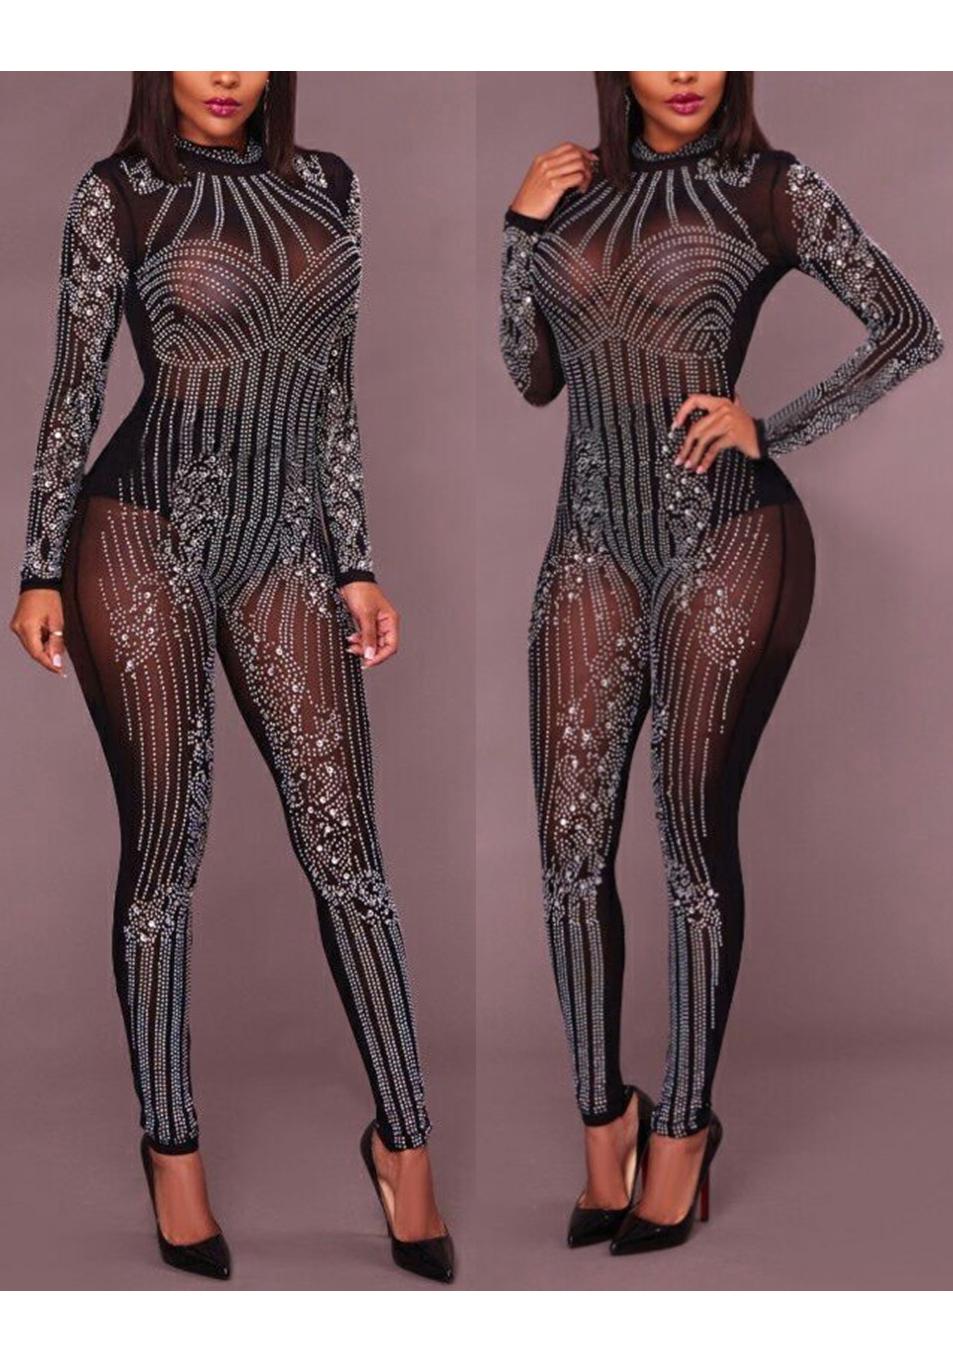 Black Mosaic Rhinestone Grenadine Sparkly Glitter Bodysuit Romper High  Waisted Clubwear Long Jumpsuit 0c6654a25